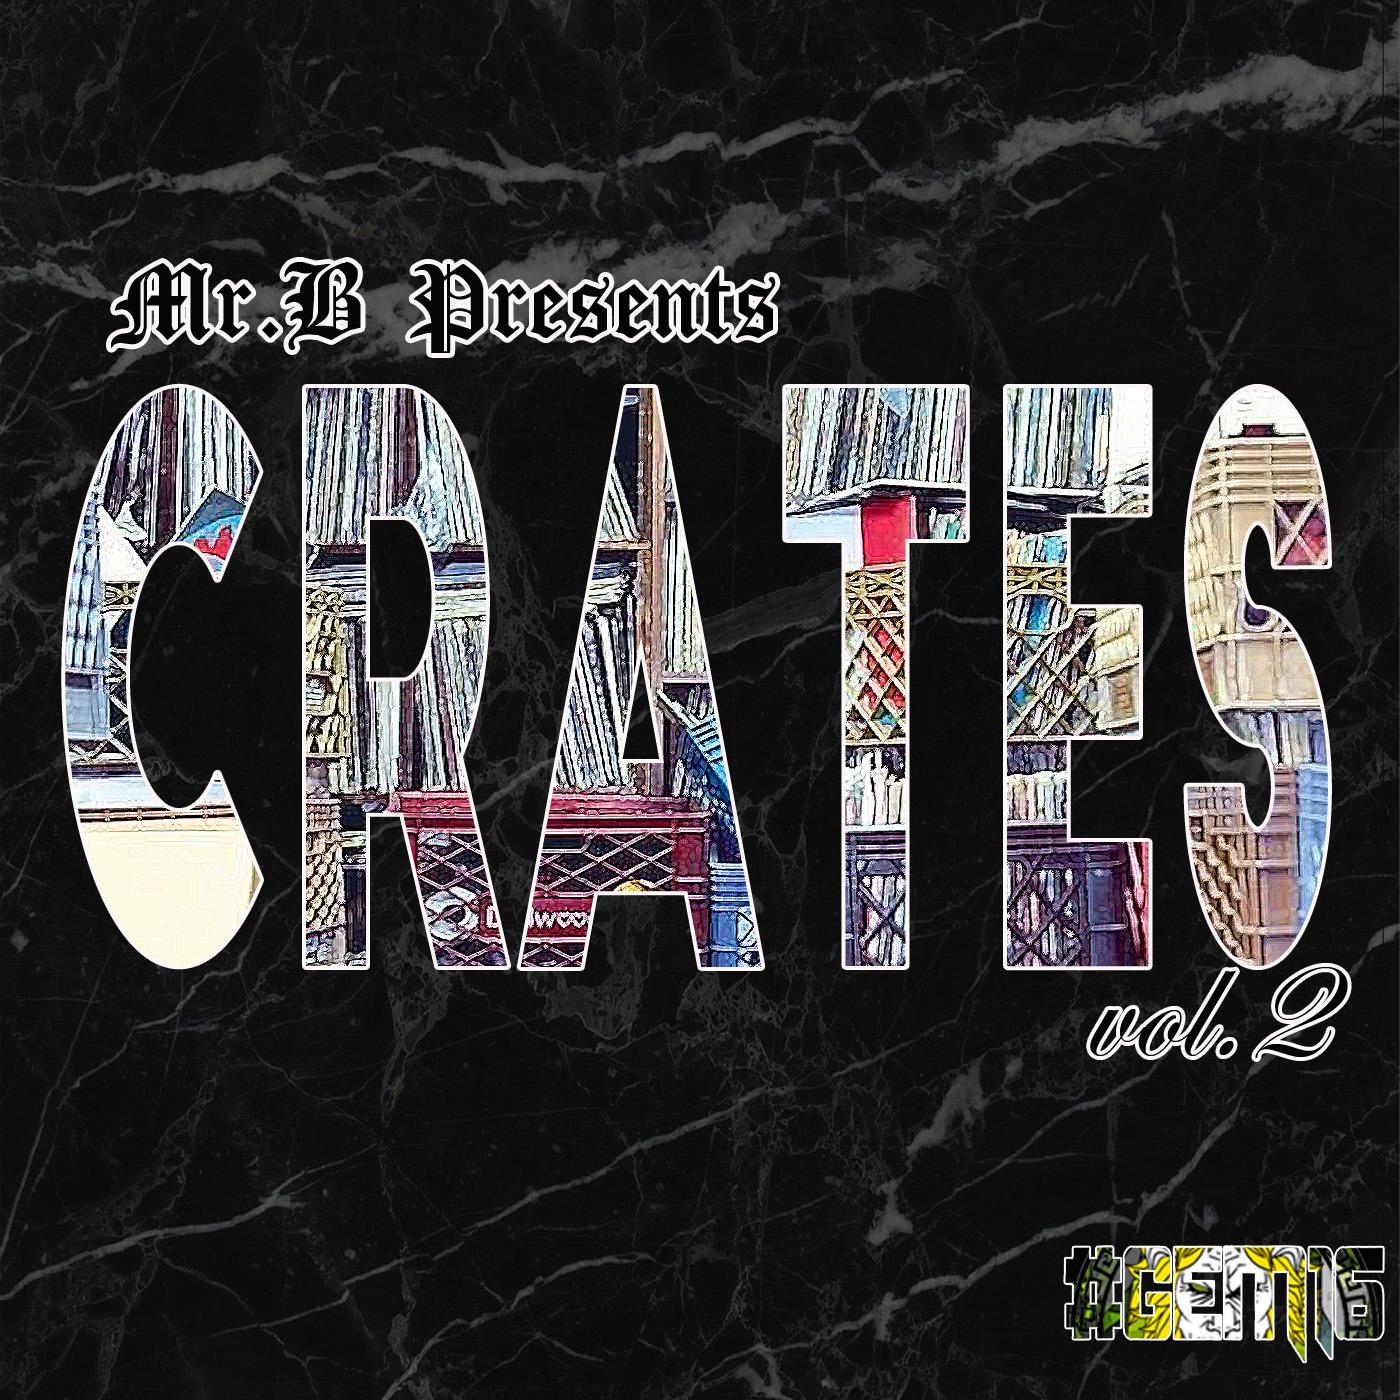 [Beat Tape Compilation] Mr.B Presents Crates Vol. 2